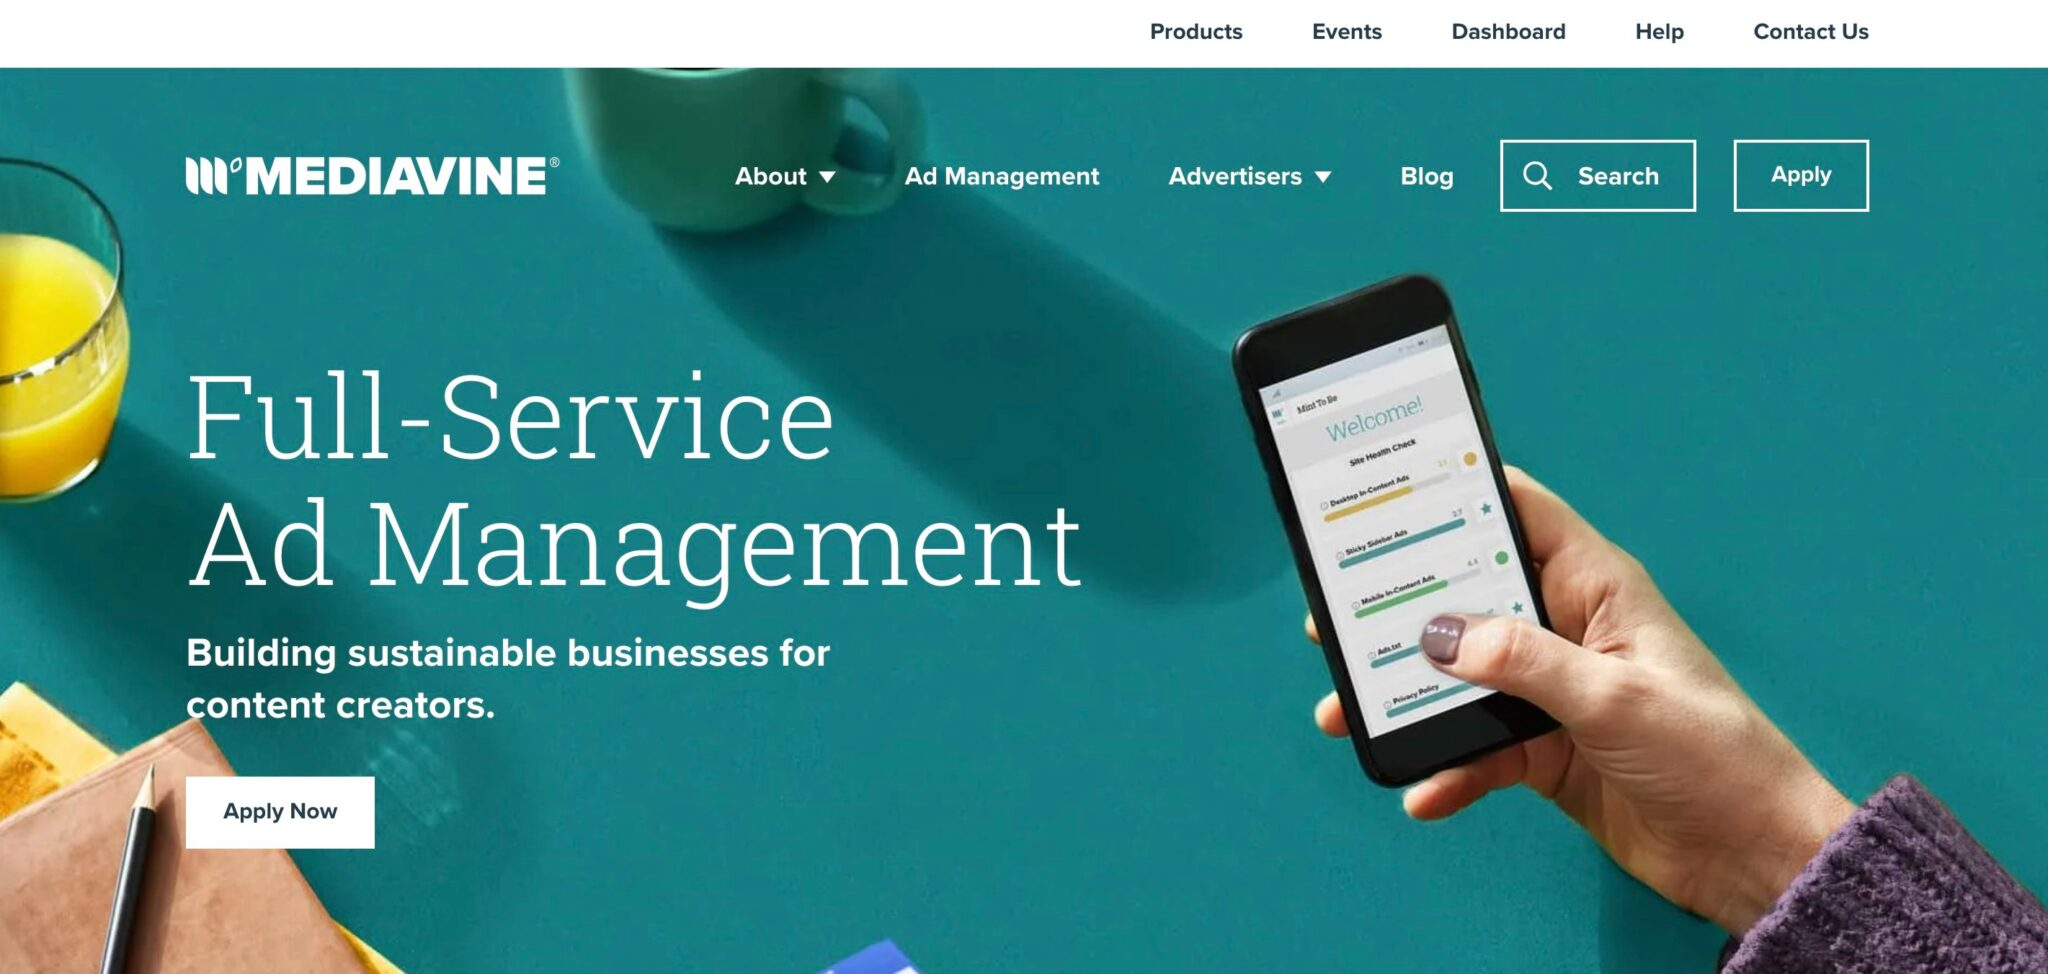 Mediavine - An Alternative to Google AdSense